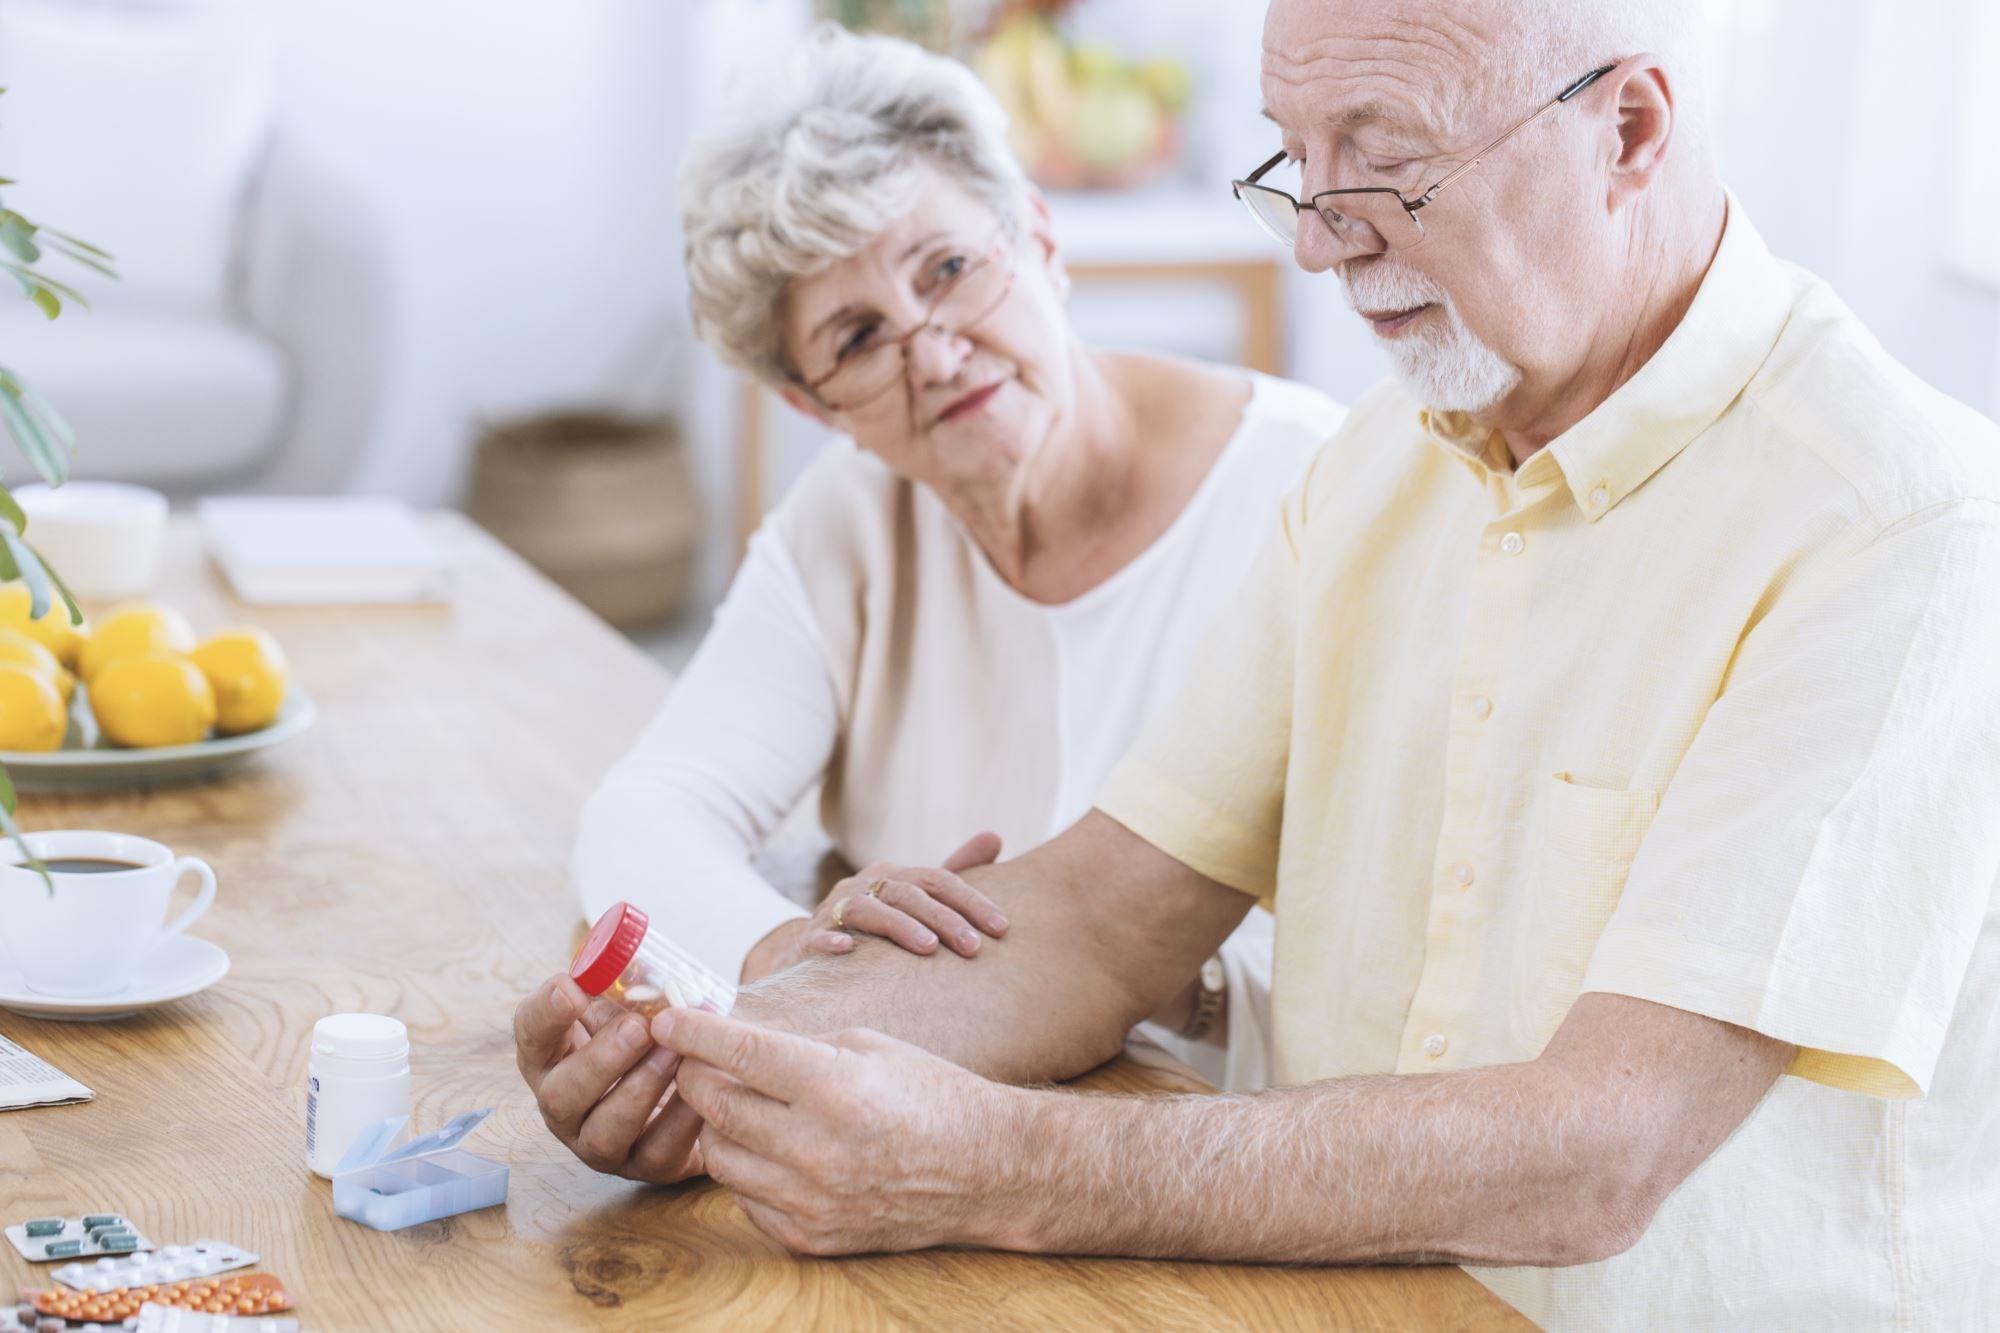 Liraglutide May Prevent Dementia in Elderly With Type 2 Diabetes